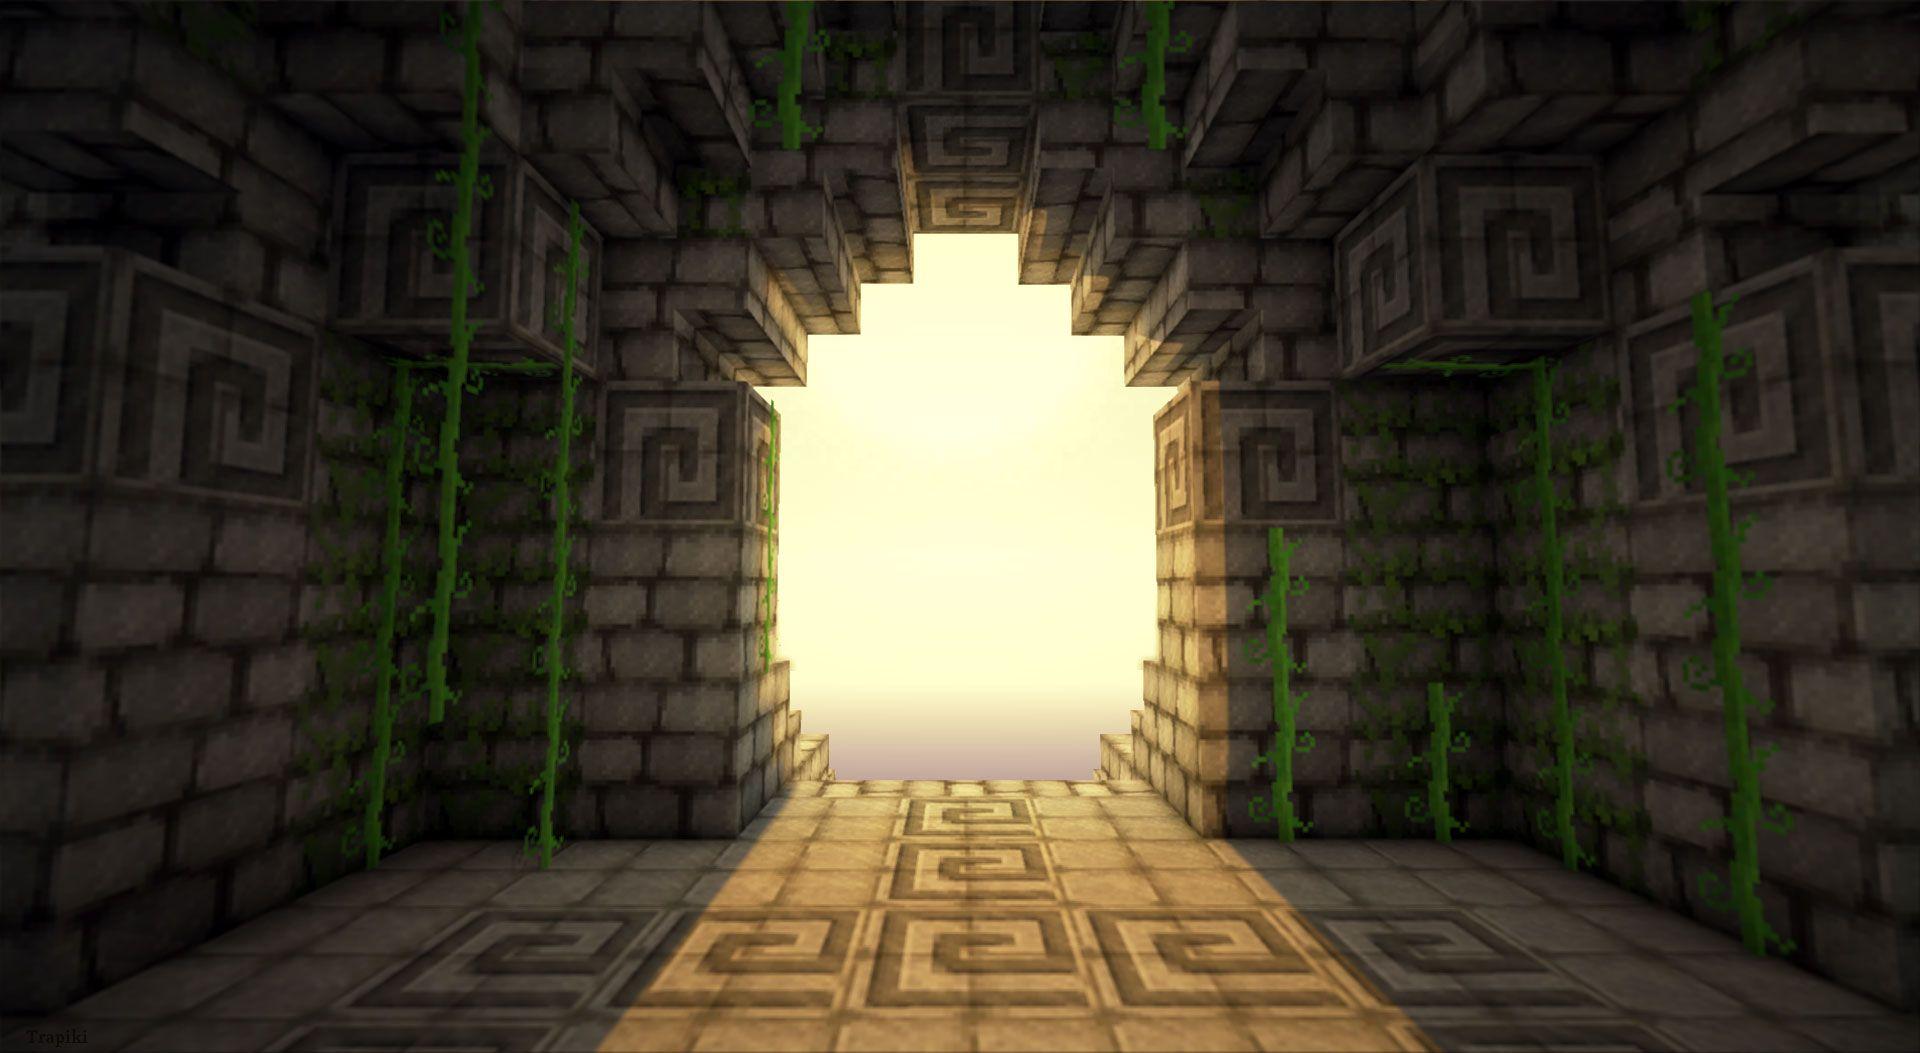 Fantastic Wallpaper Minecraft Simple - edab020adde00a673d484a99fa614019  Picture_279589.jpg